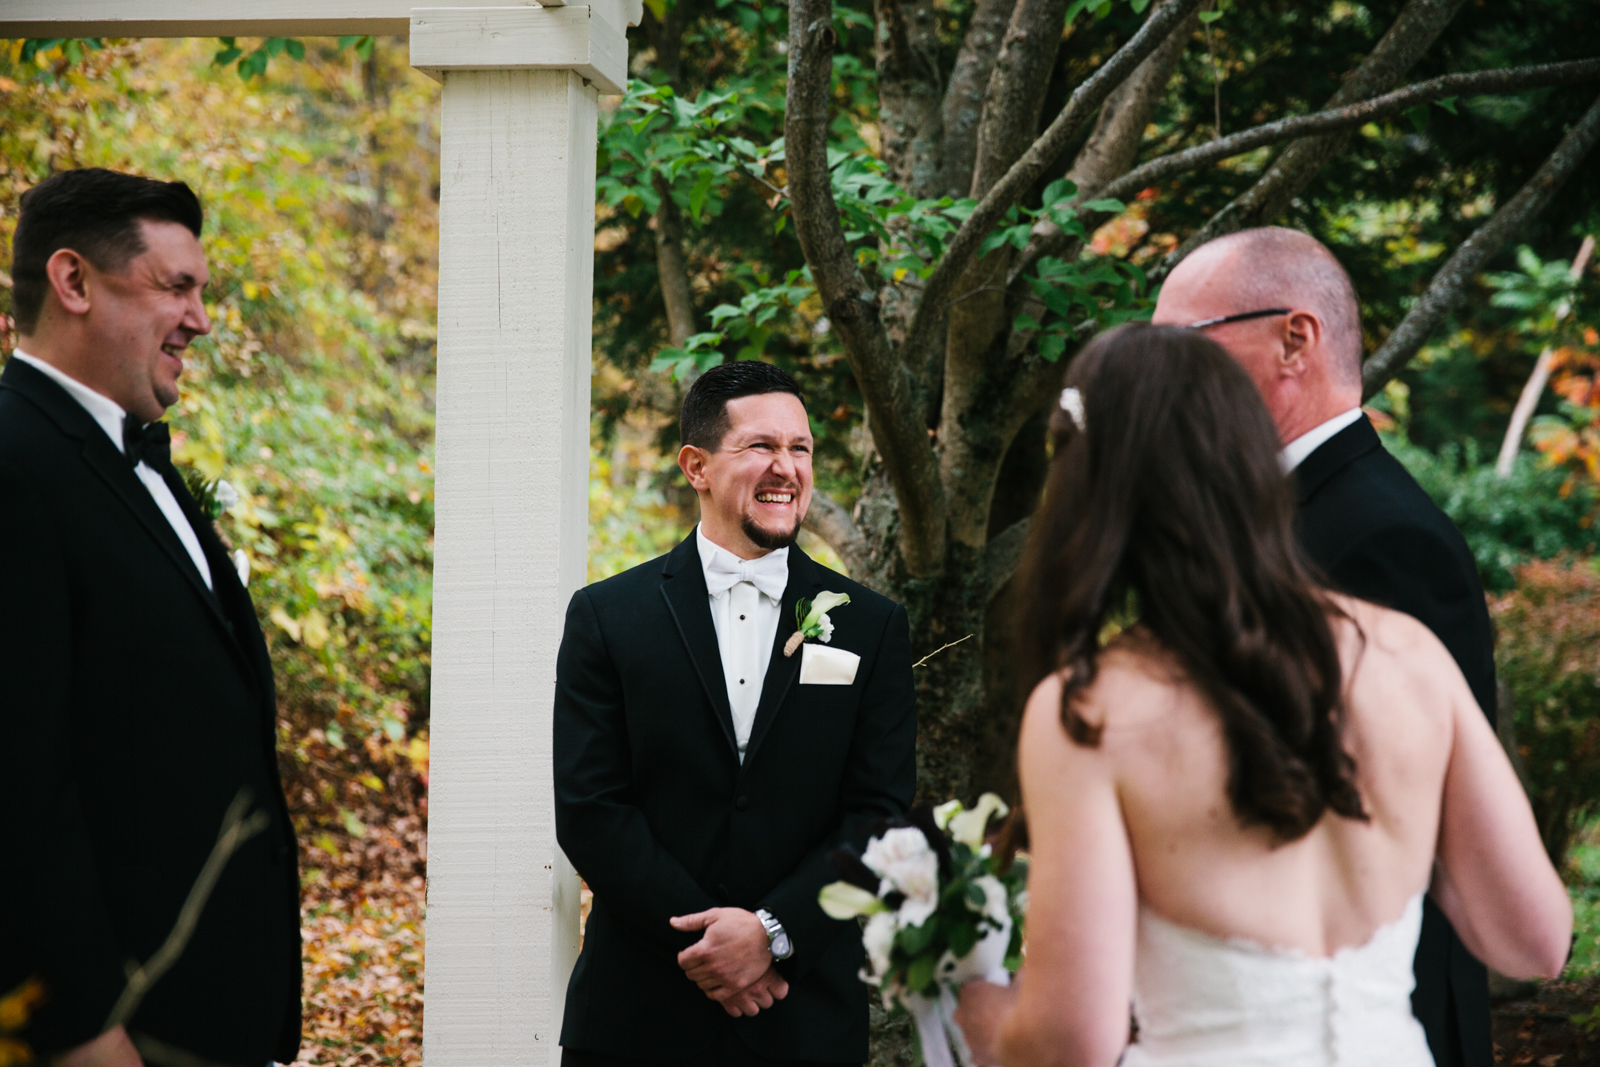 Glimmerstone-Mansion-Vermont-Wedding-Photography-Amanda-Morgan-55.jpg